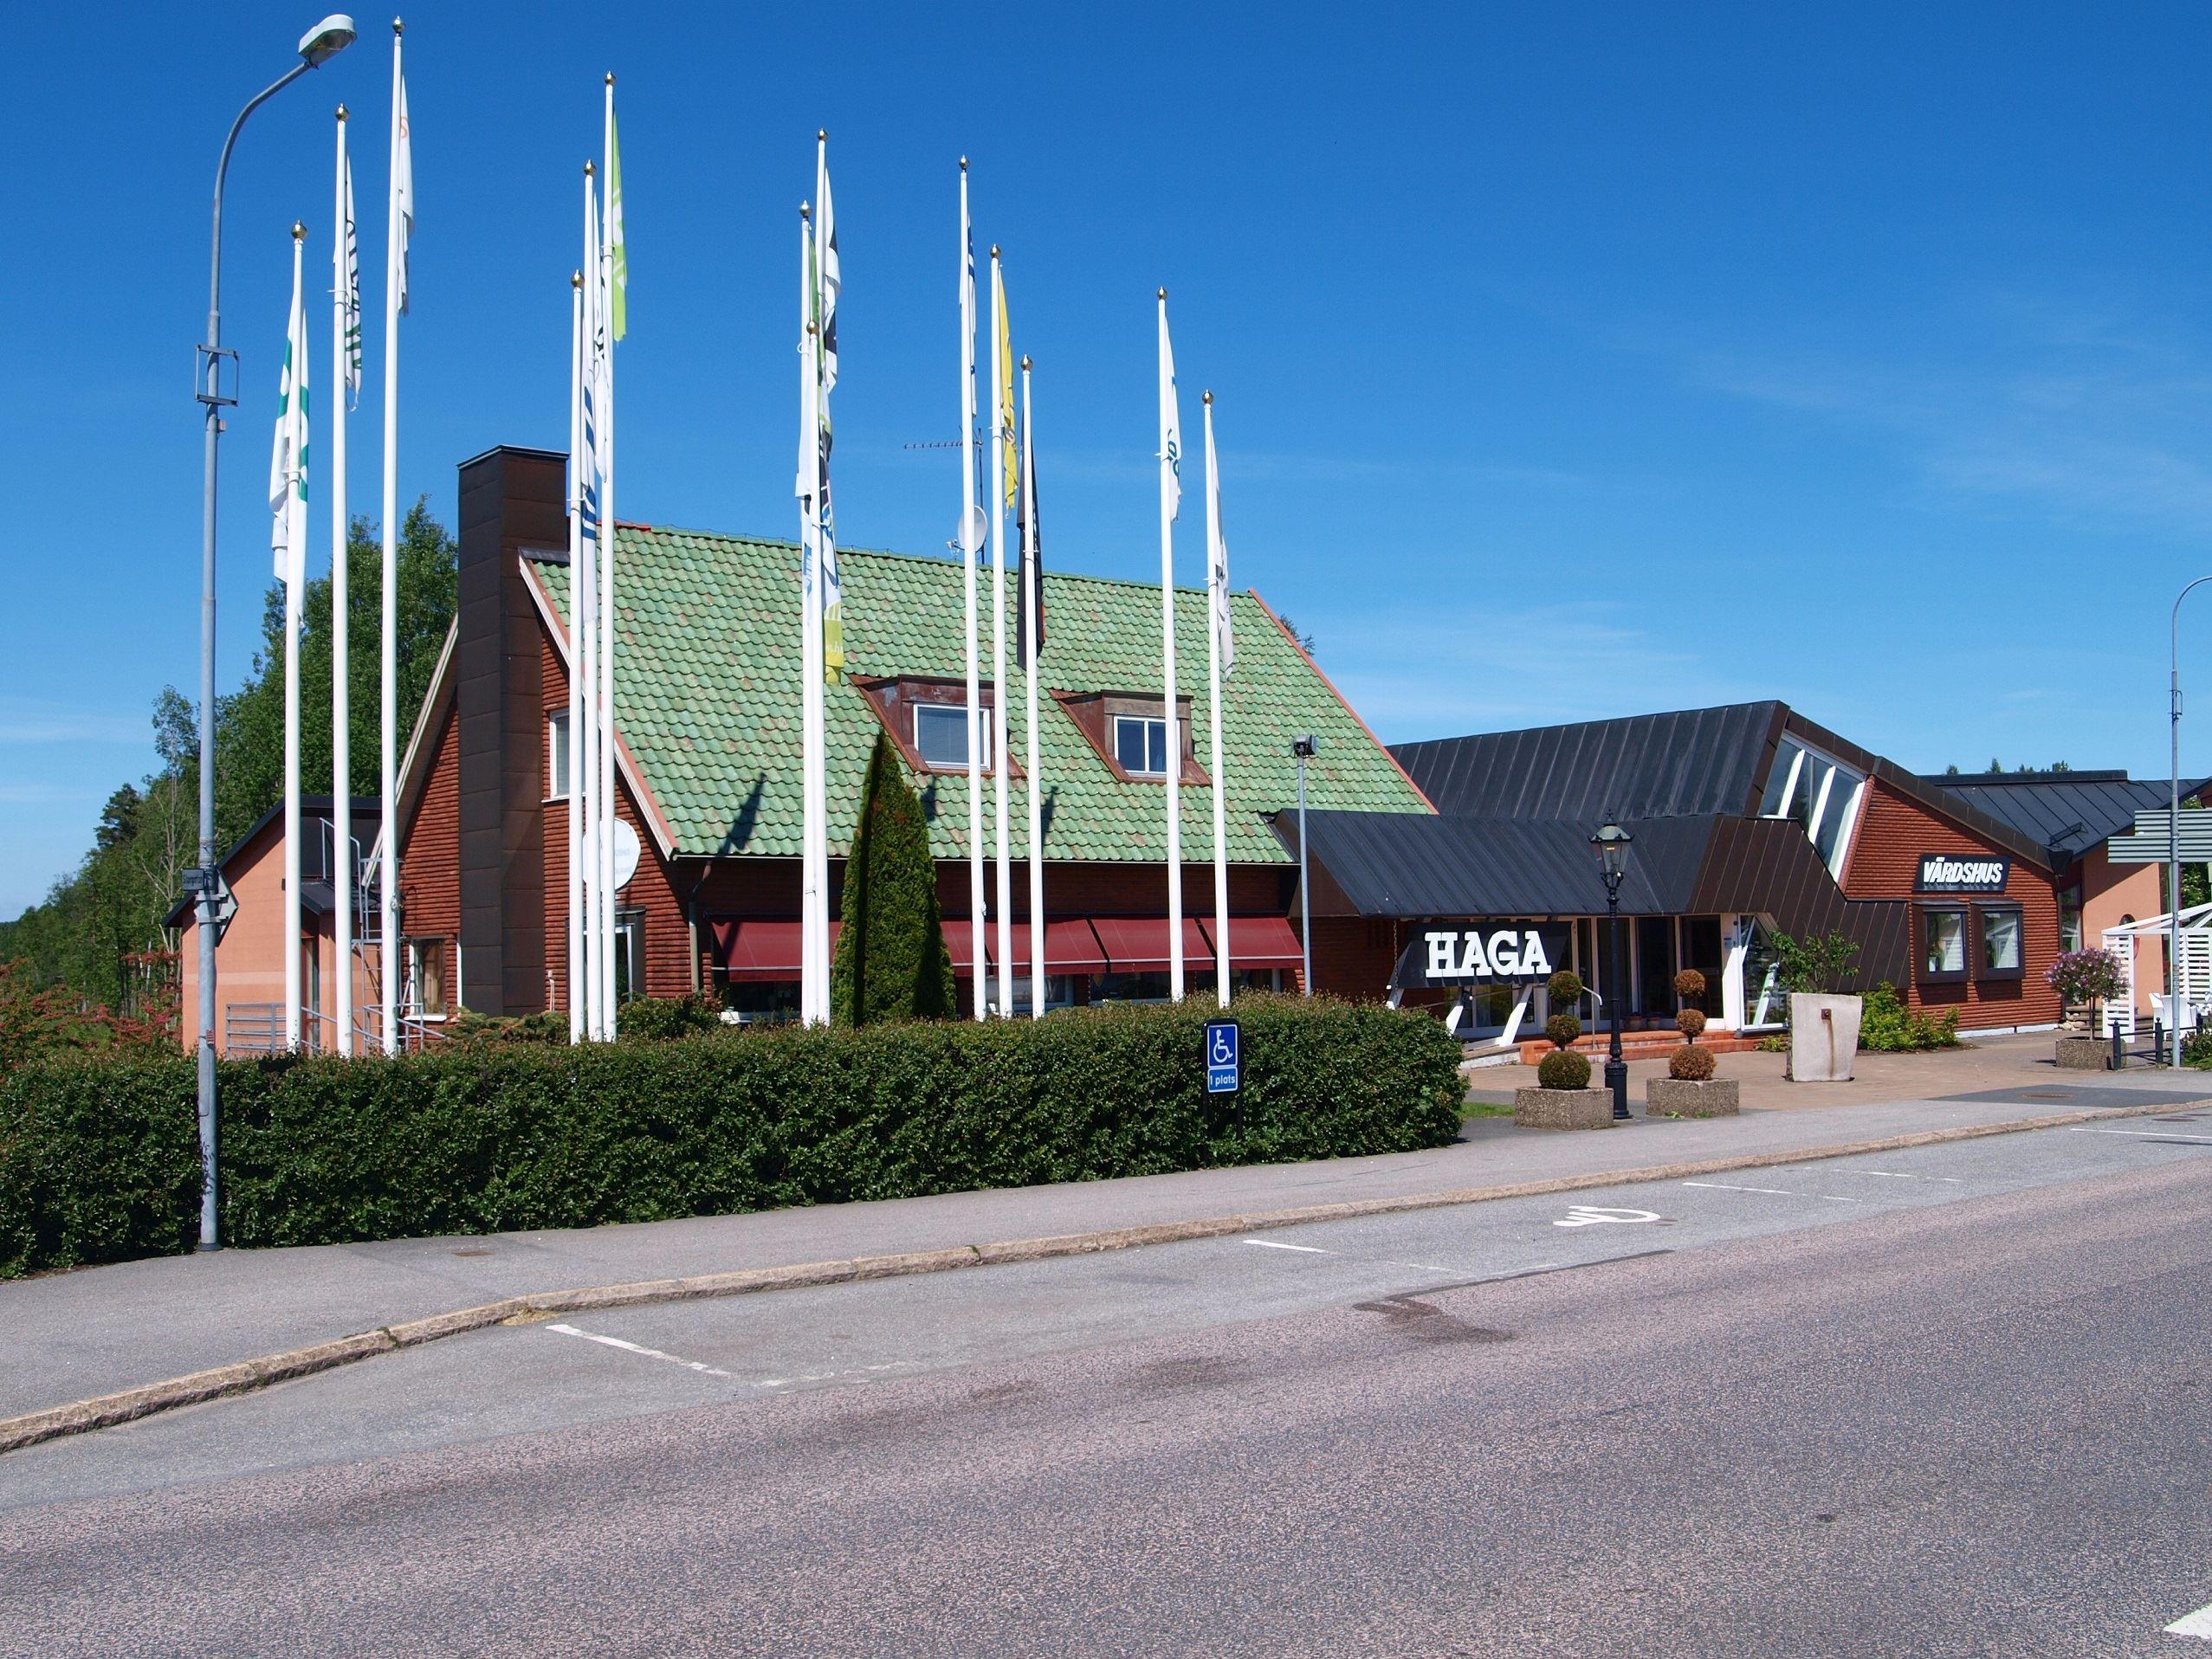 Haga värdshus - Haga Inn